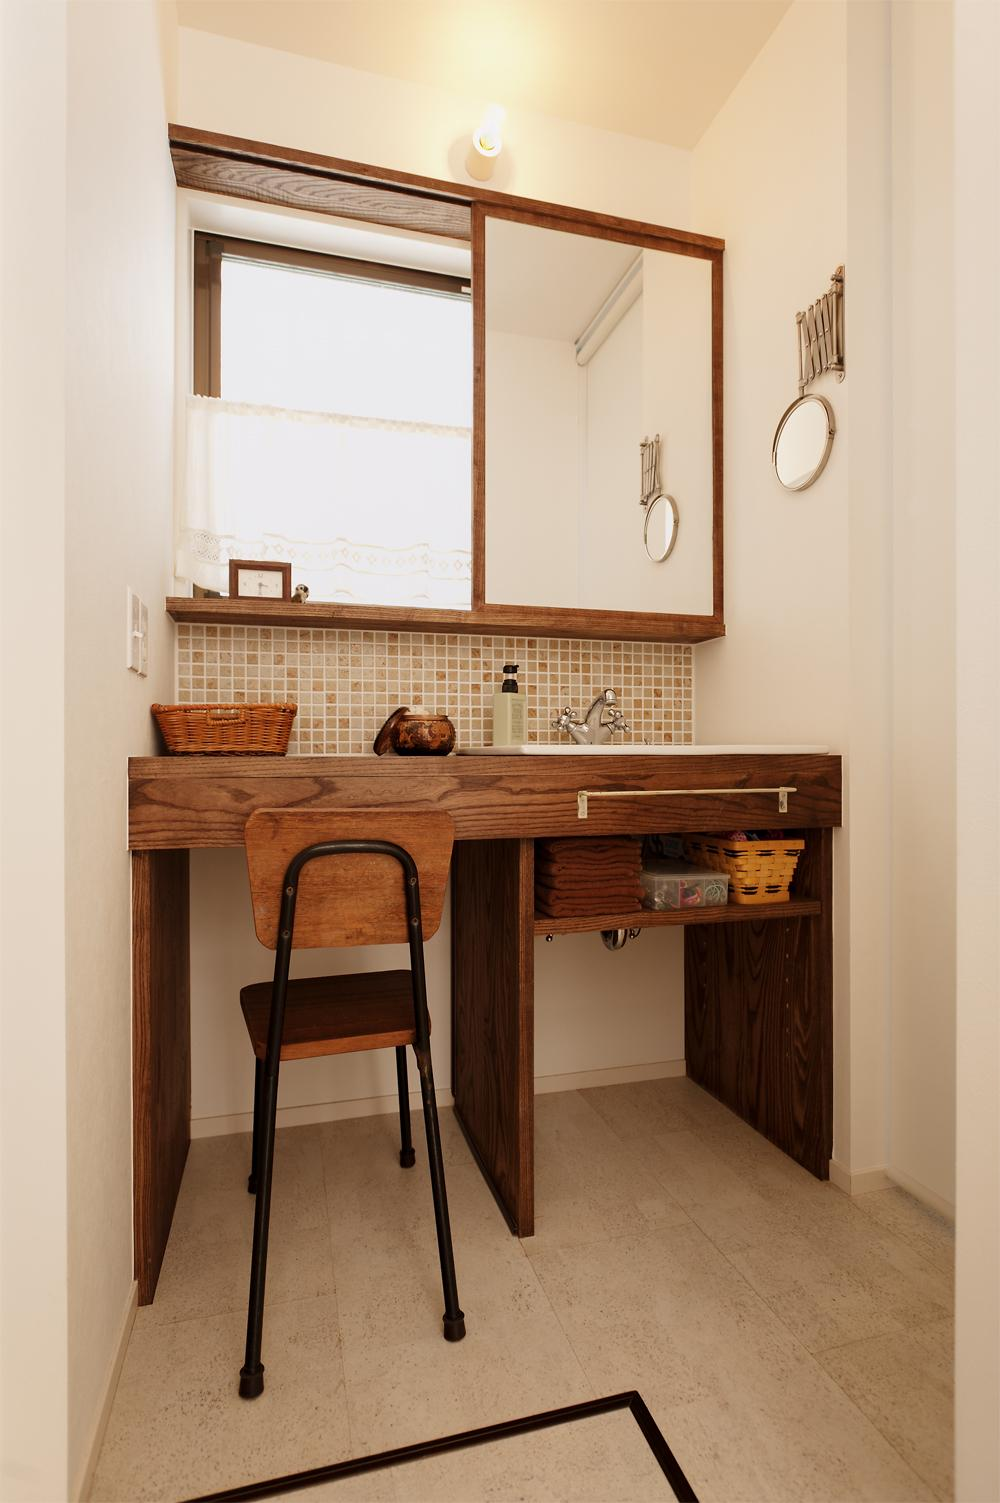 T邸・家族のくらしをより楽しく豊かにするとっておきの家の部屋 こだわりの洗面室